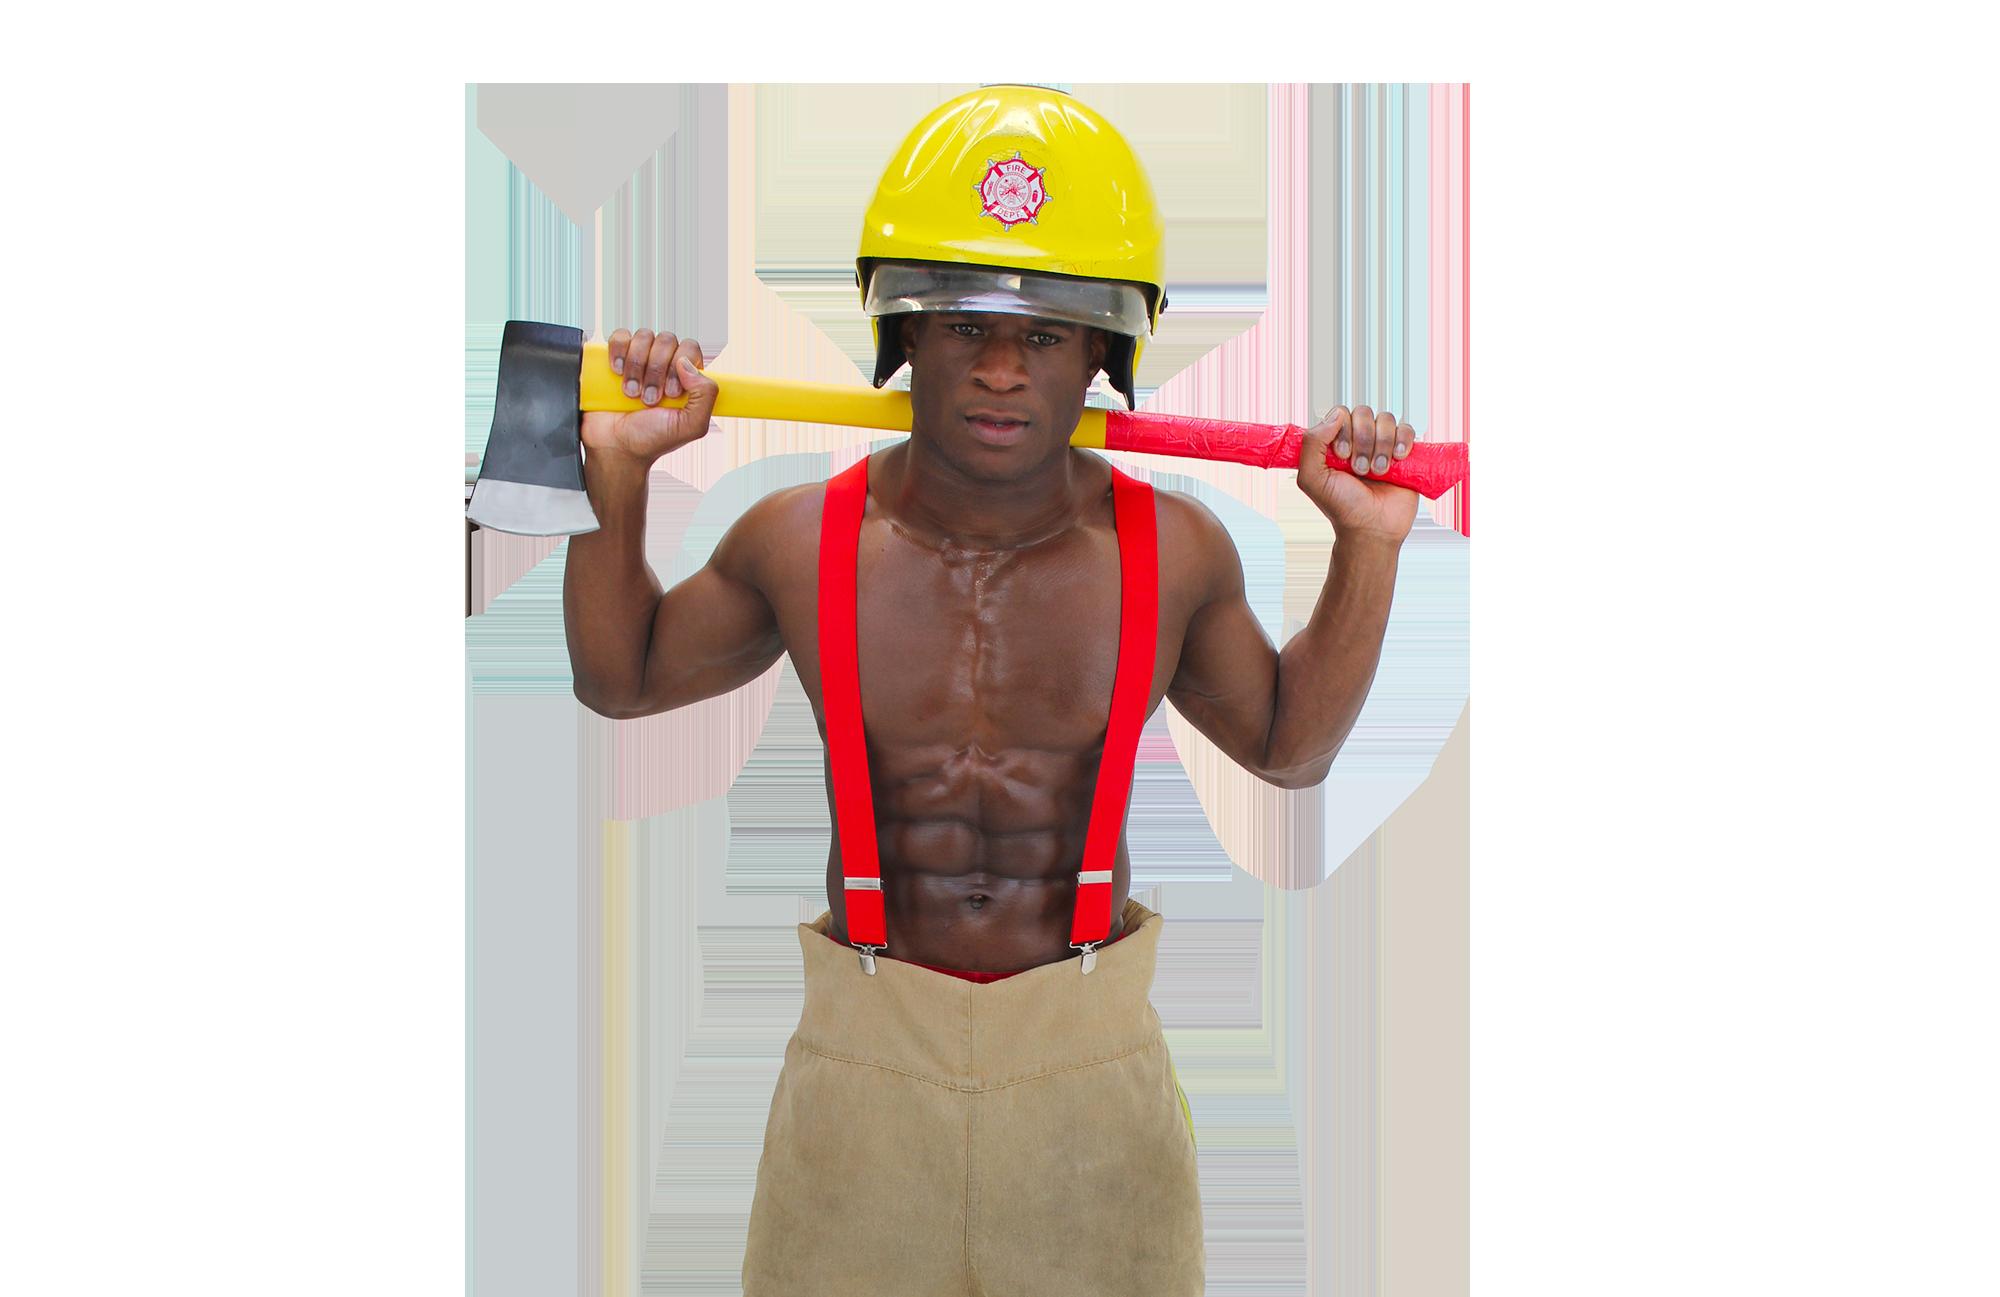 carousel-fireman